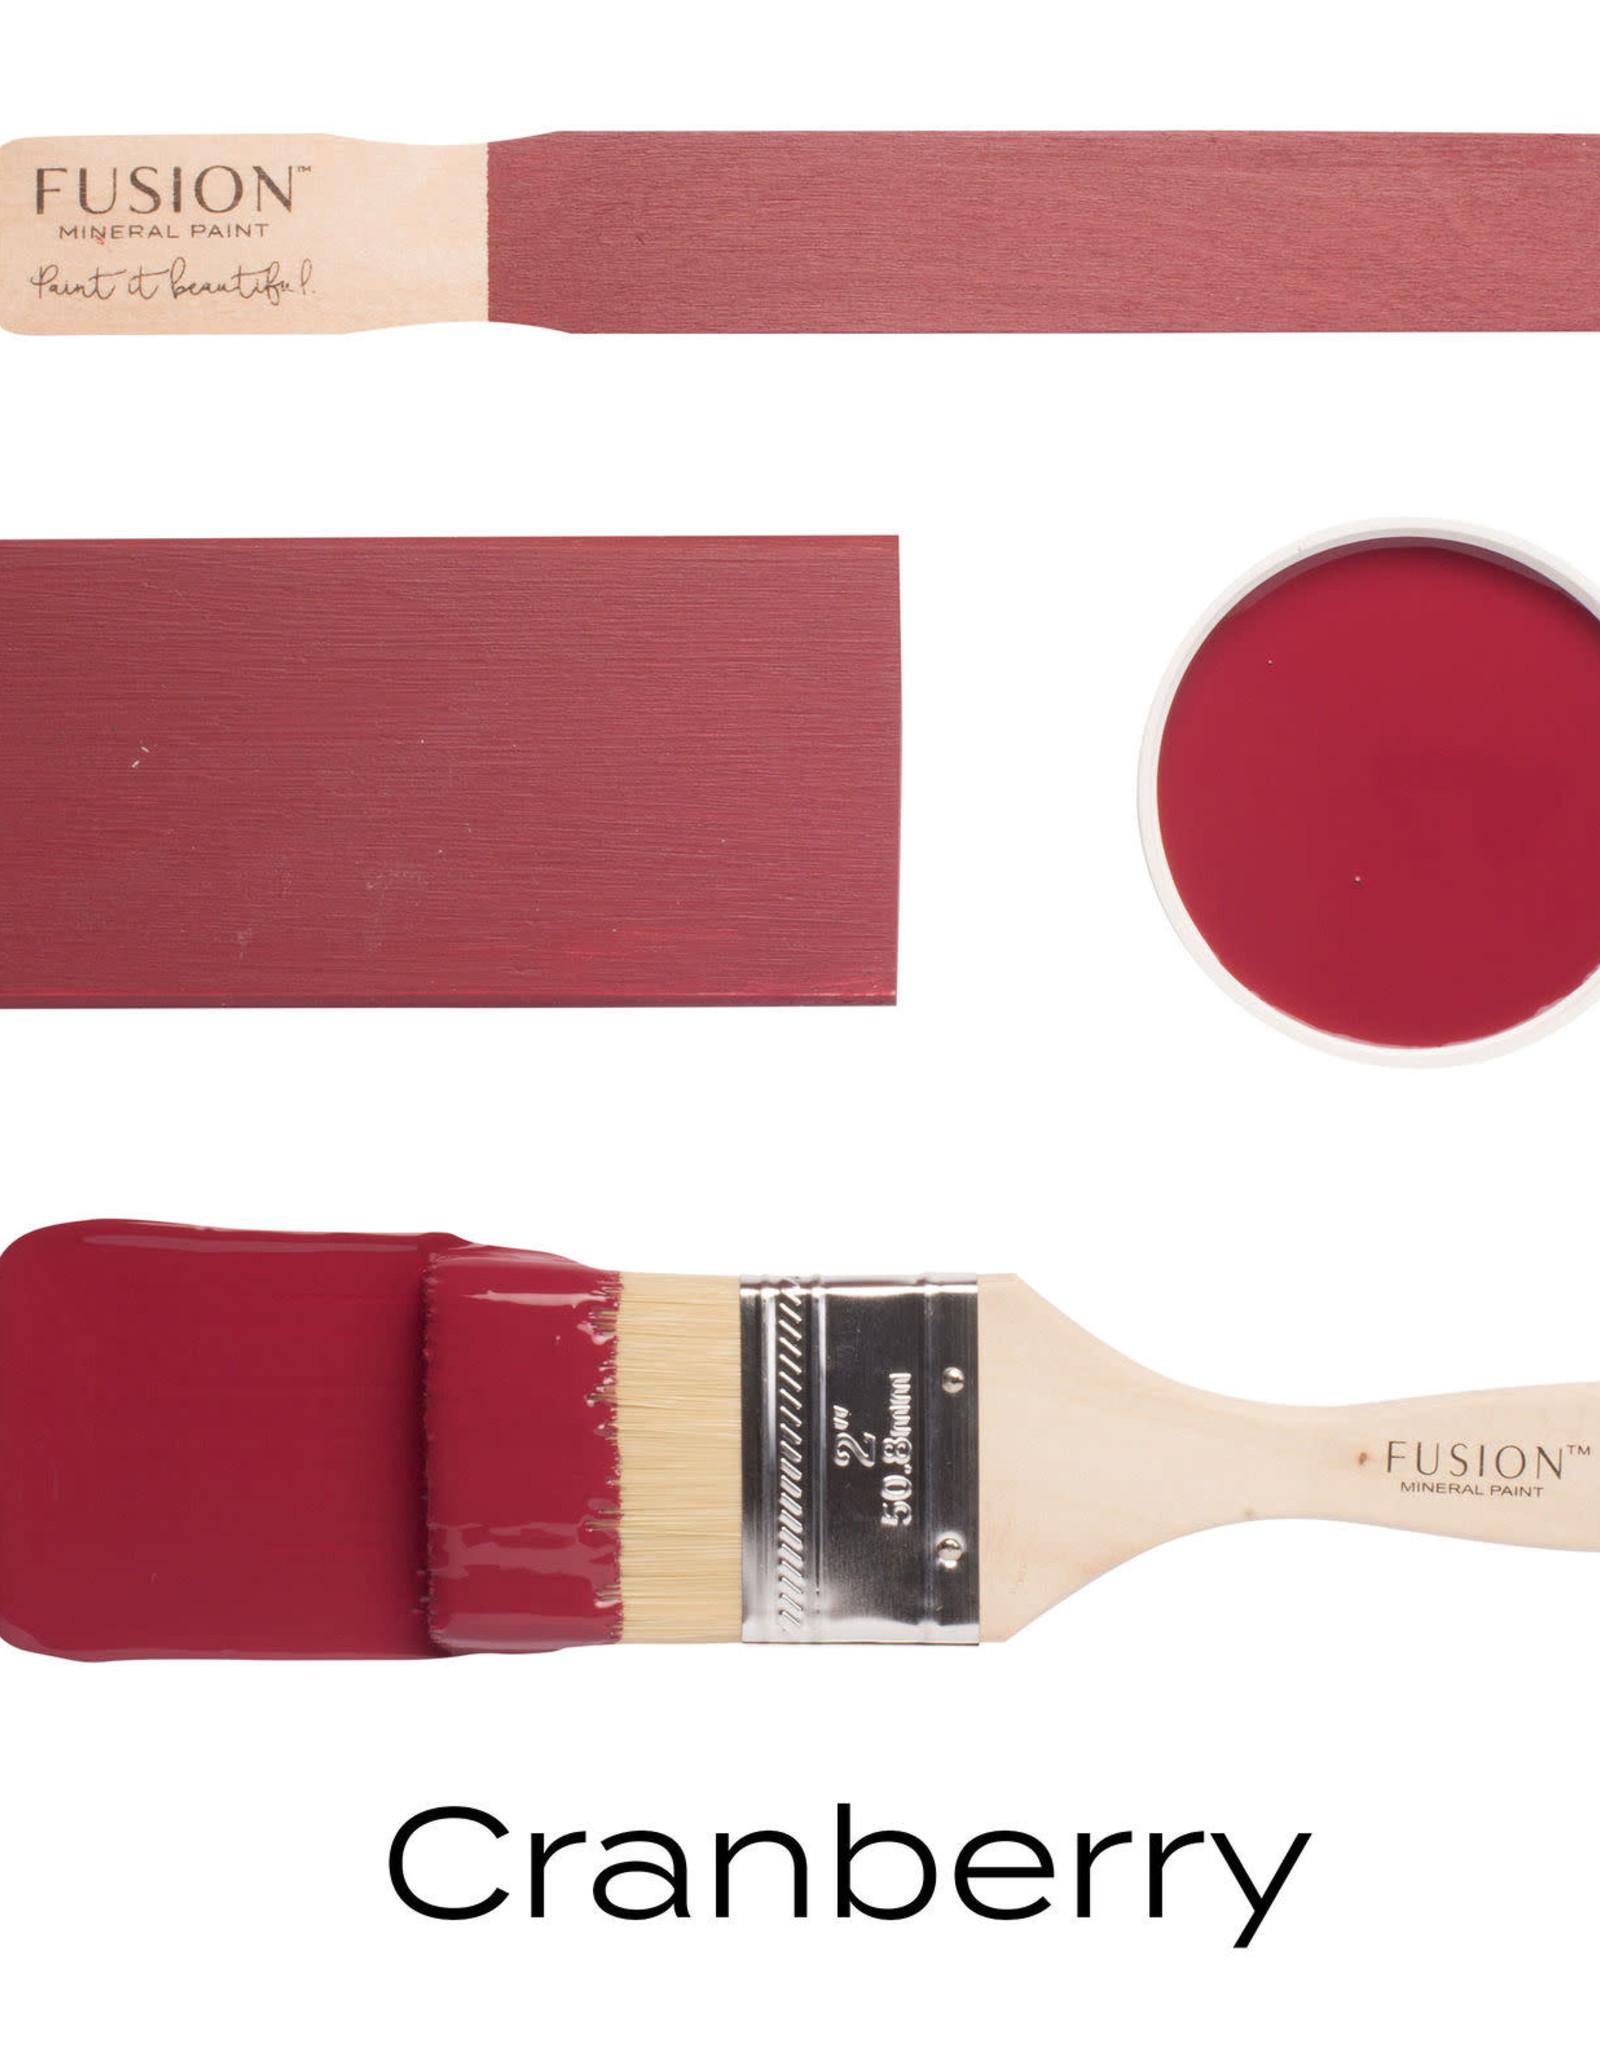 Fusion Mineral Paint Fusion Mineral Paint - Cranberry 37ml